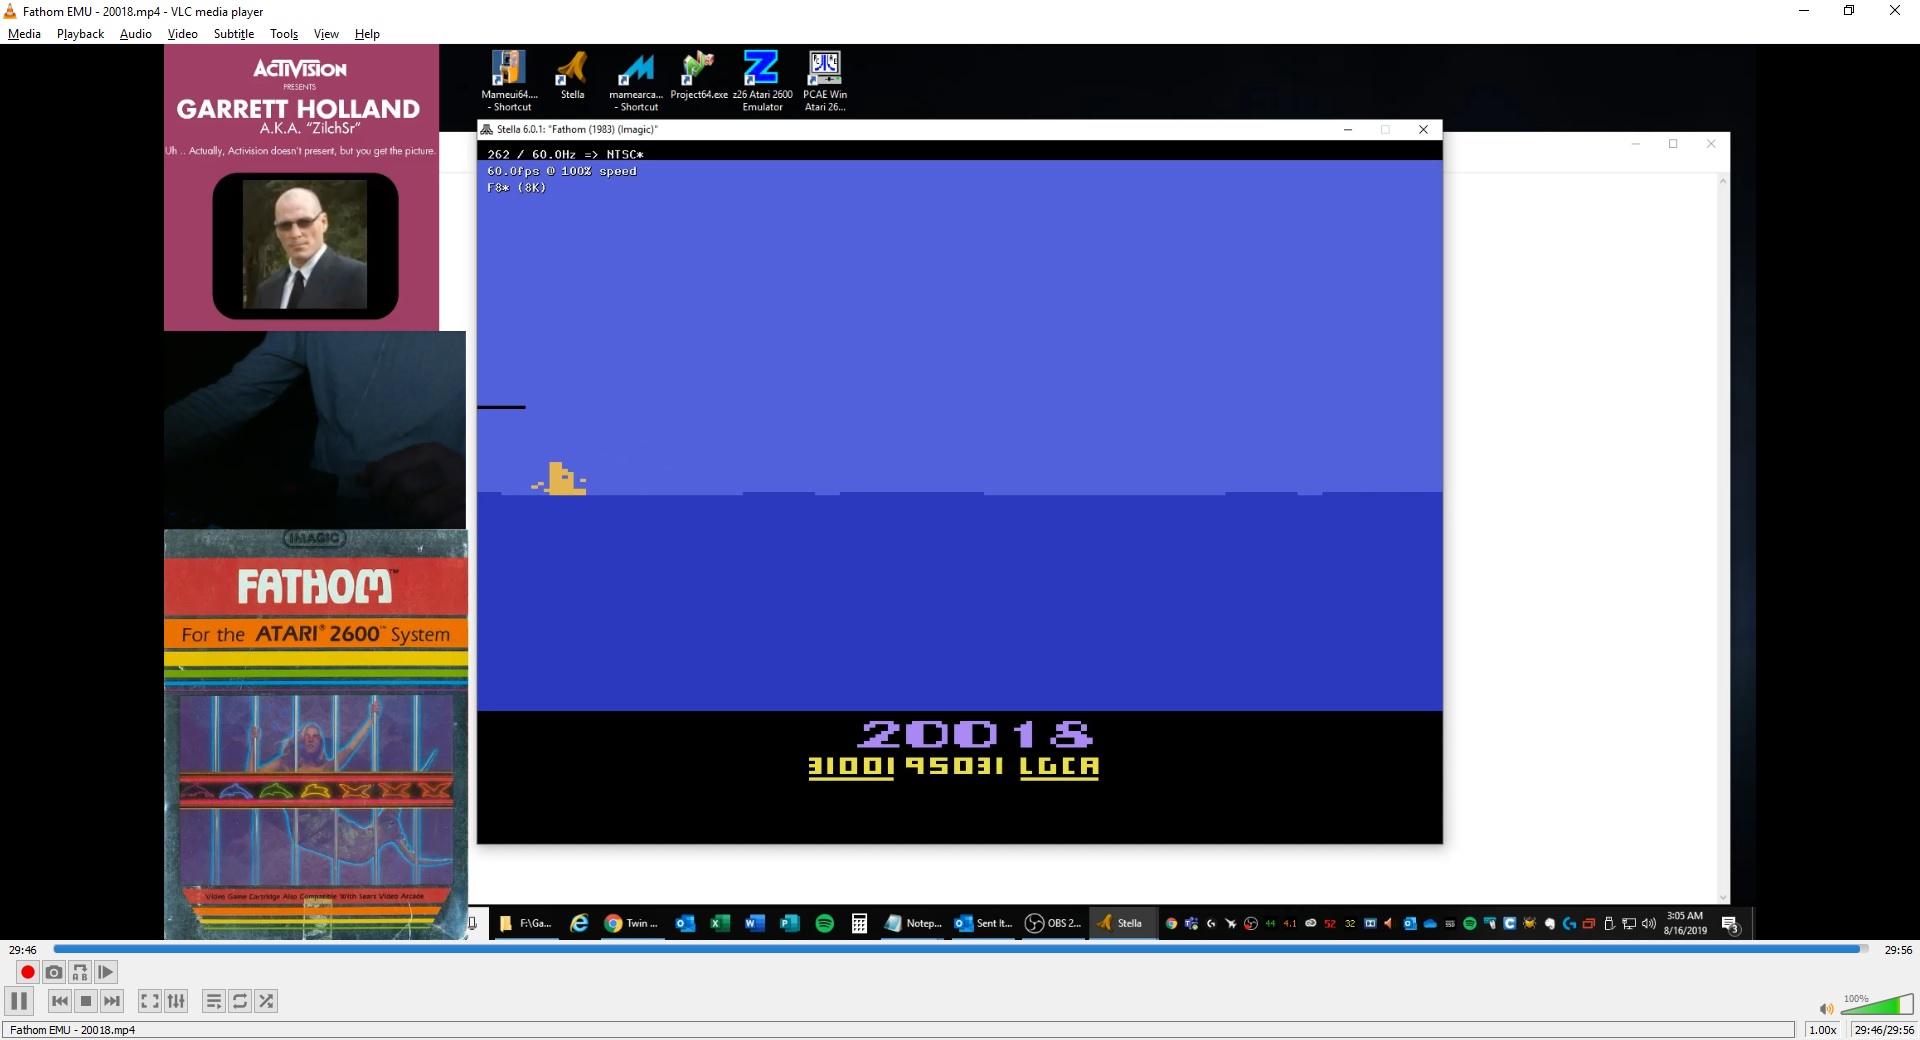 ZilchSr: Fathom (Atari 2600 Emulated) 20,018 points on 2019-08-16 15:59:00